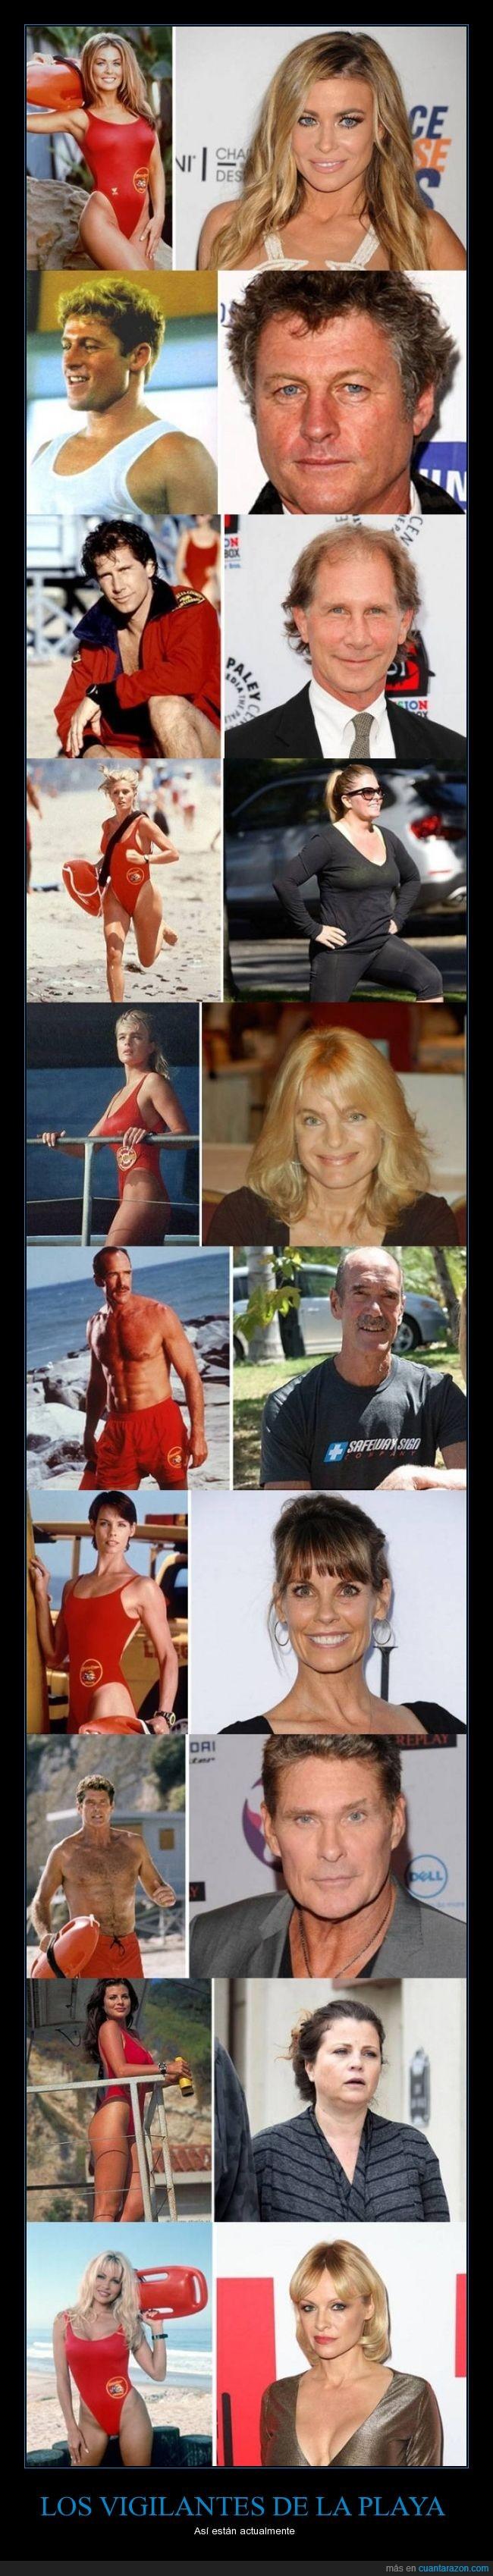 actor,actriz,David Hasselhoff,Pamela Andersen,playa,vigilante